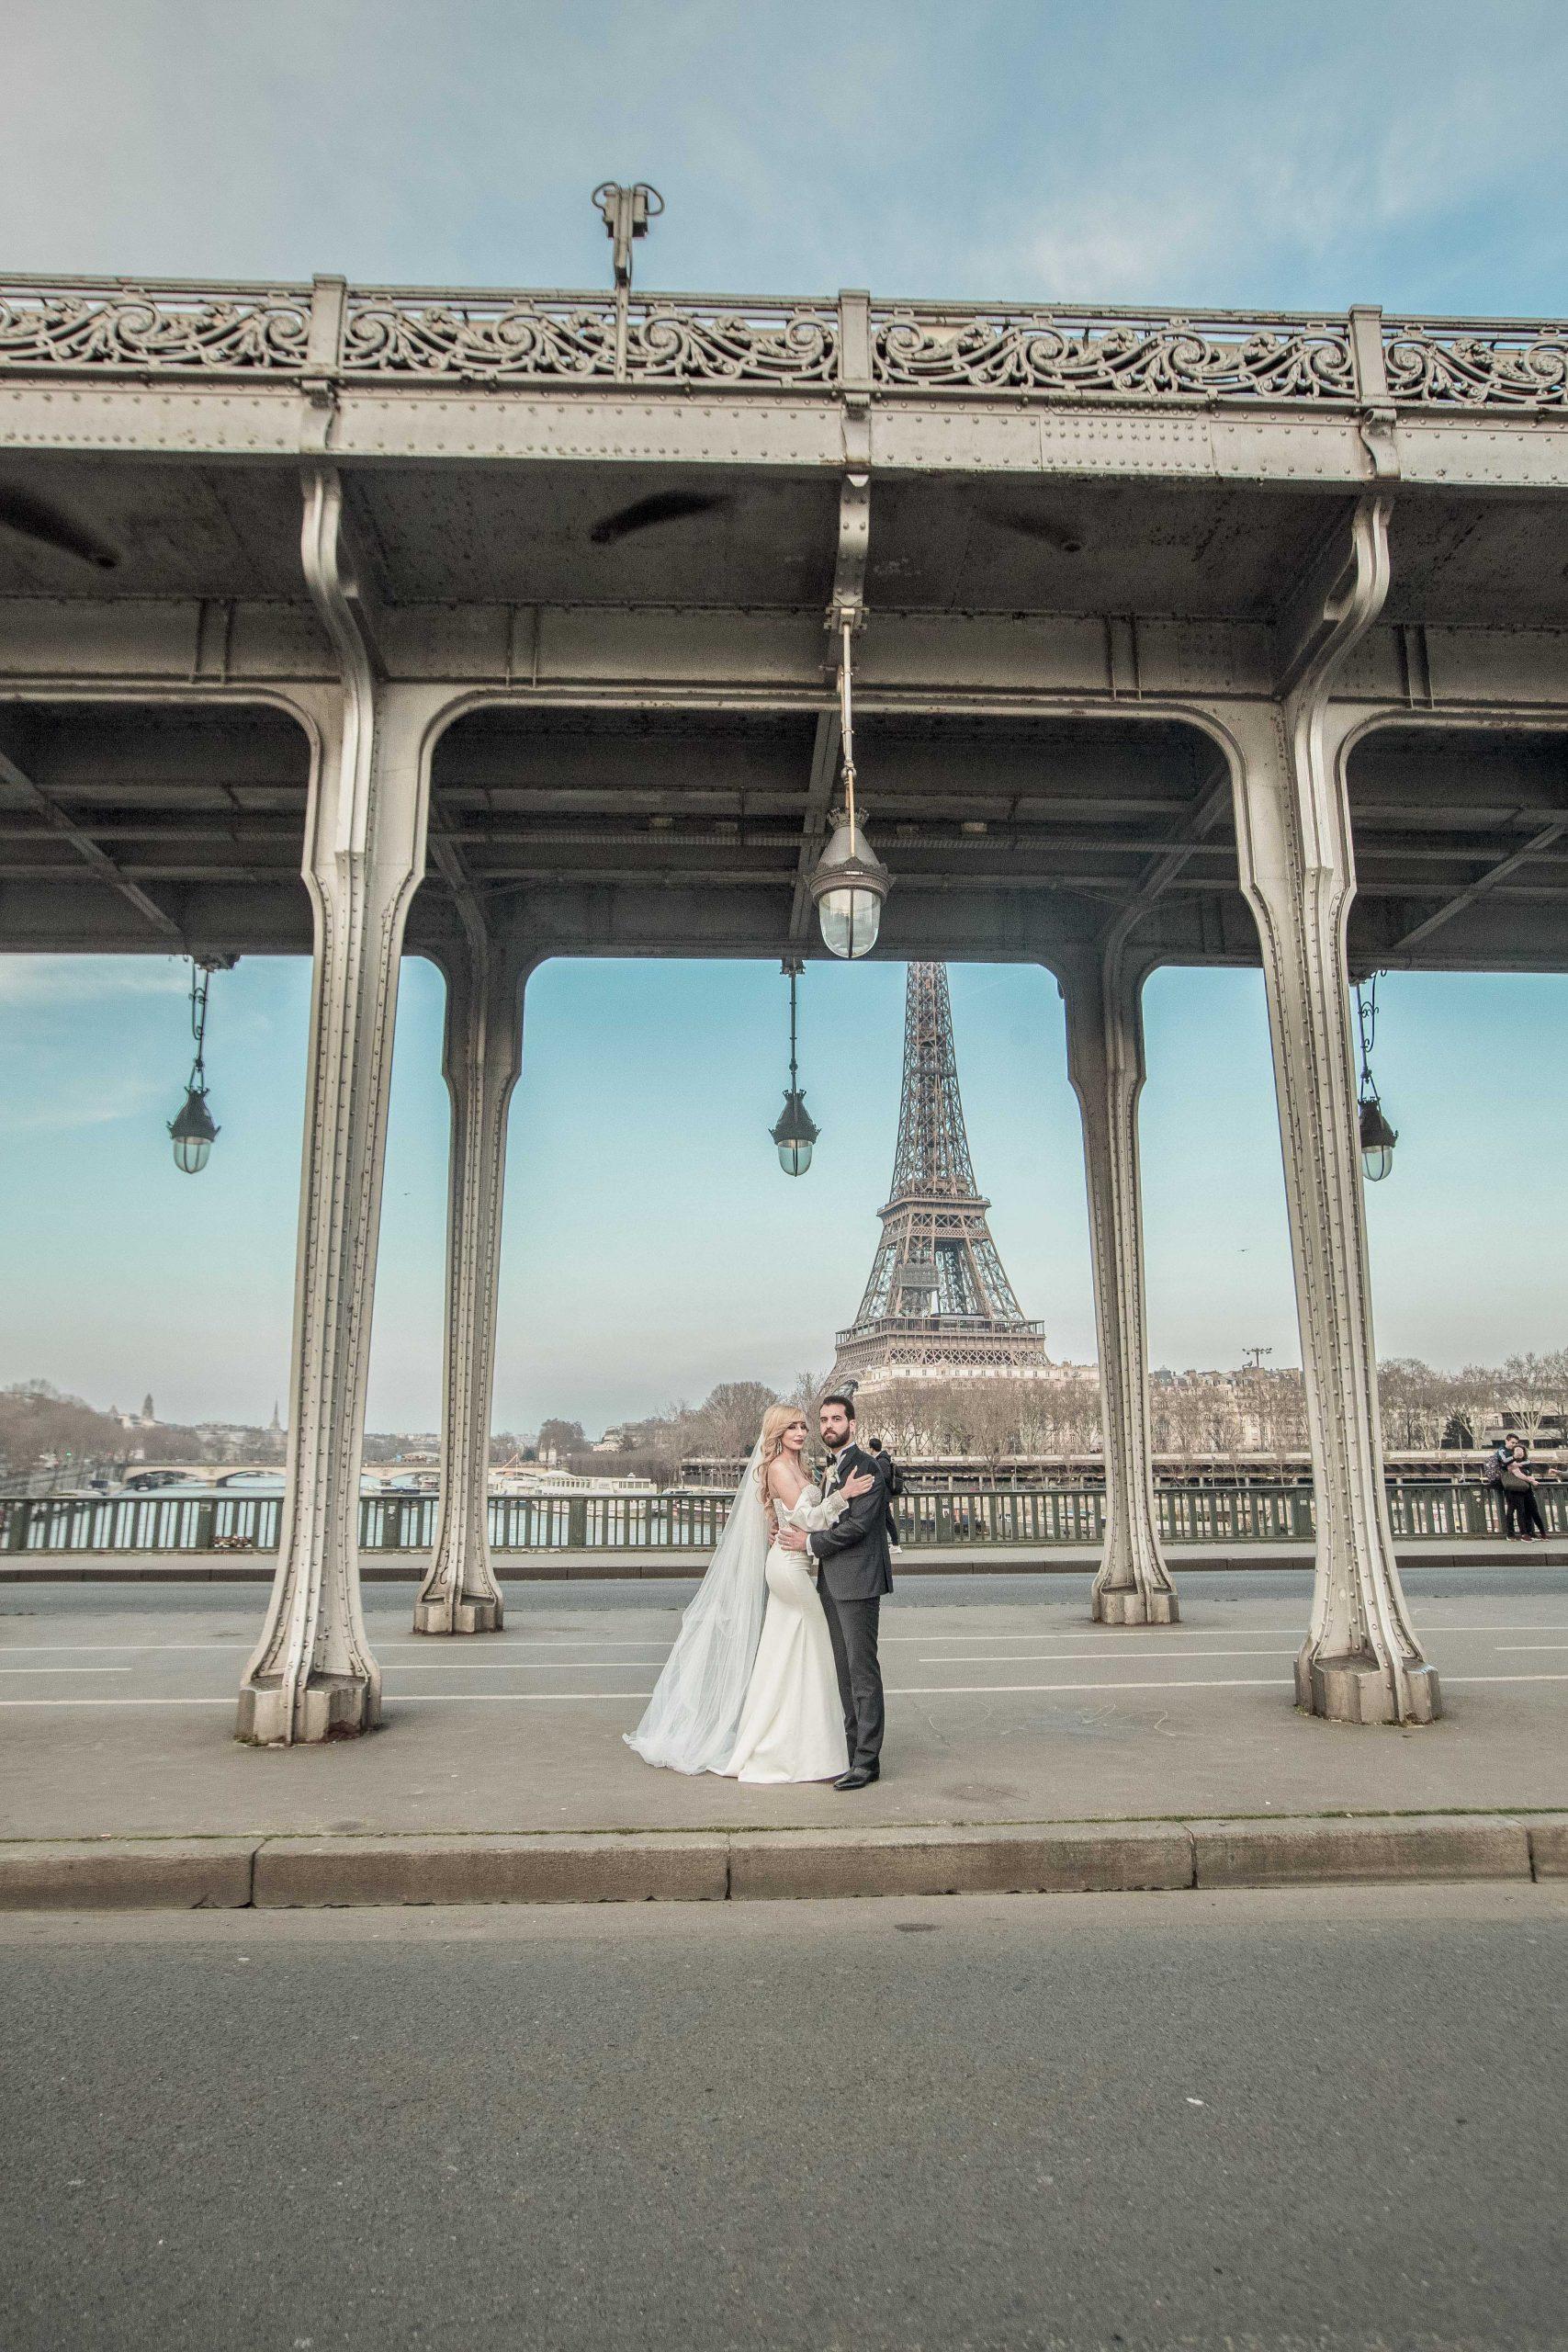 photographe-mariage-photos-marié-pont-birhakeim